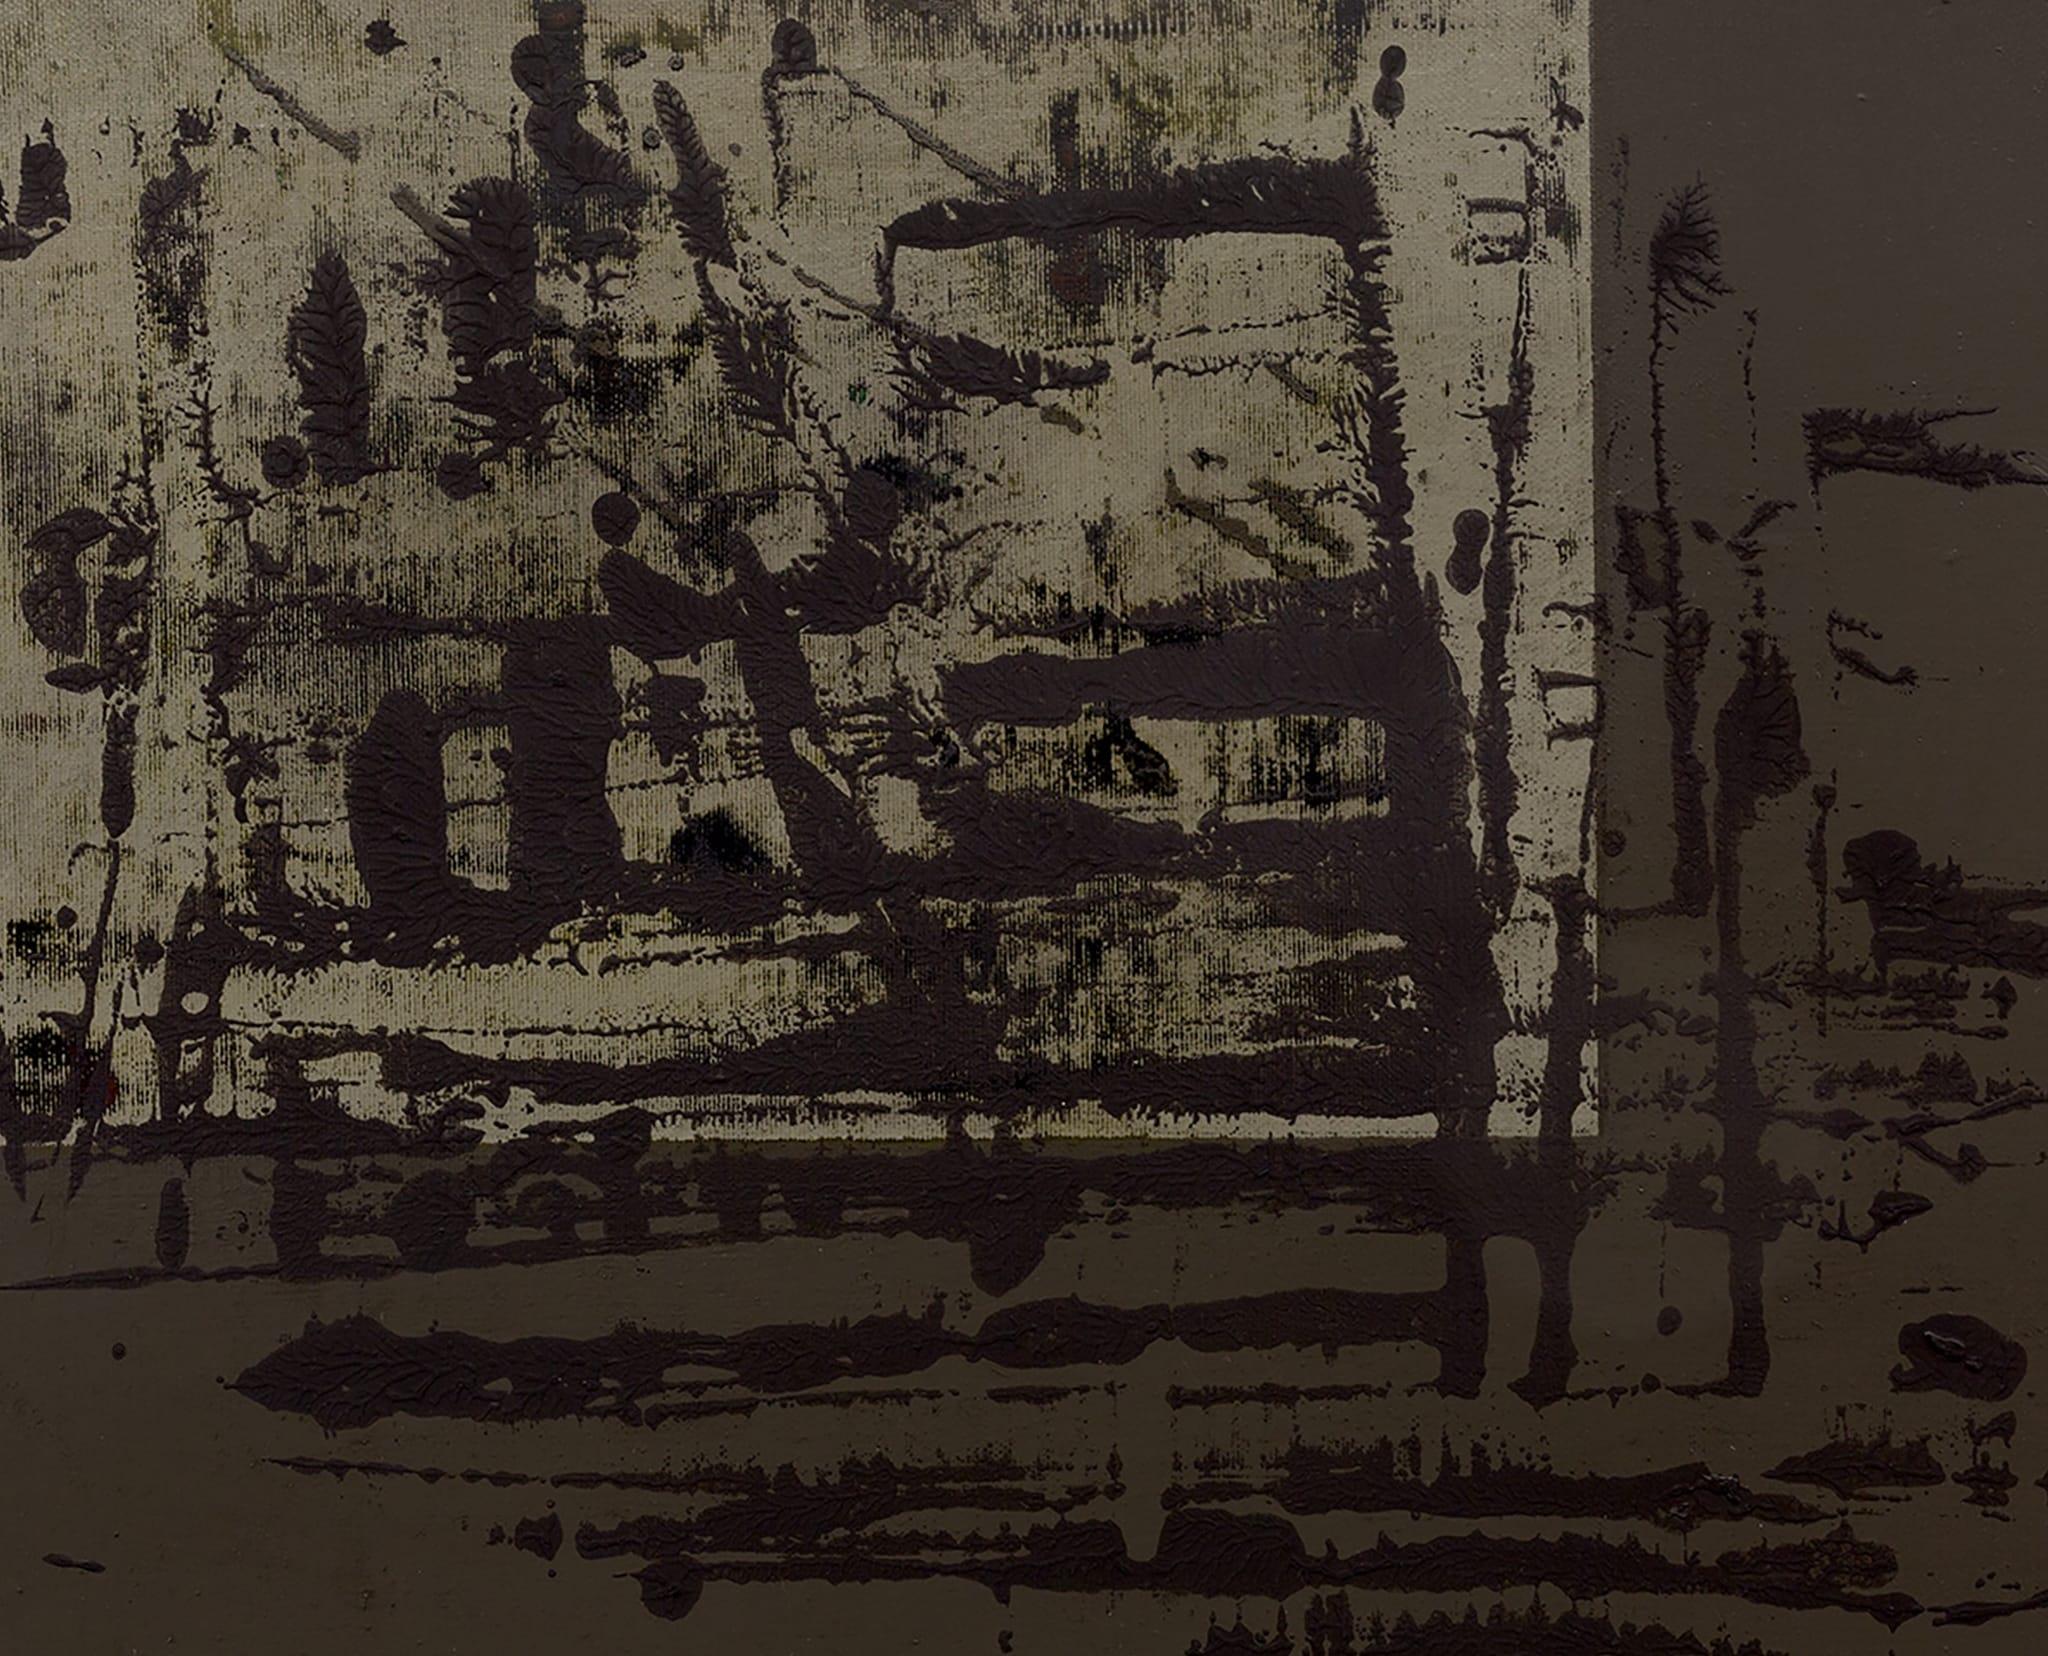 Cornerfield Painting XXXVI (Death of a Black Snake II) by Helmut Federle